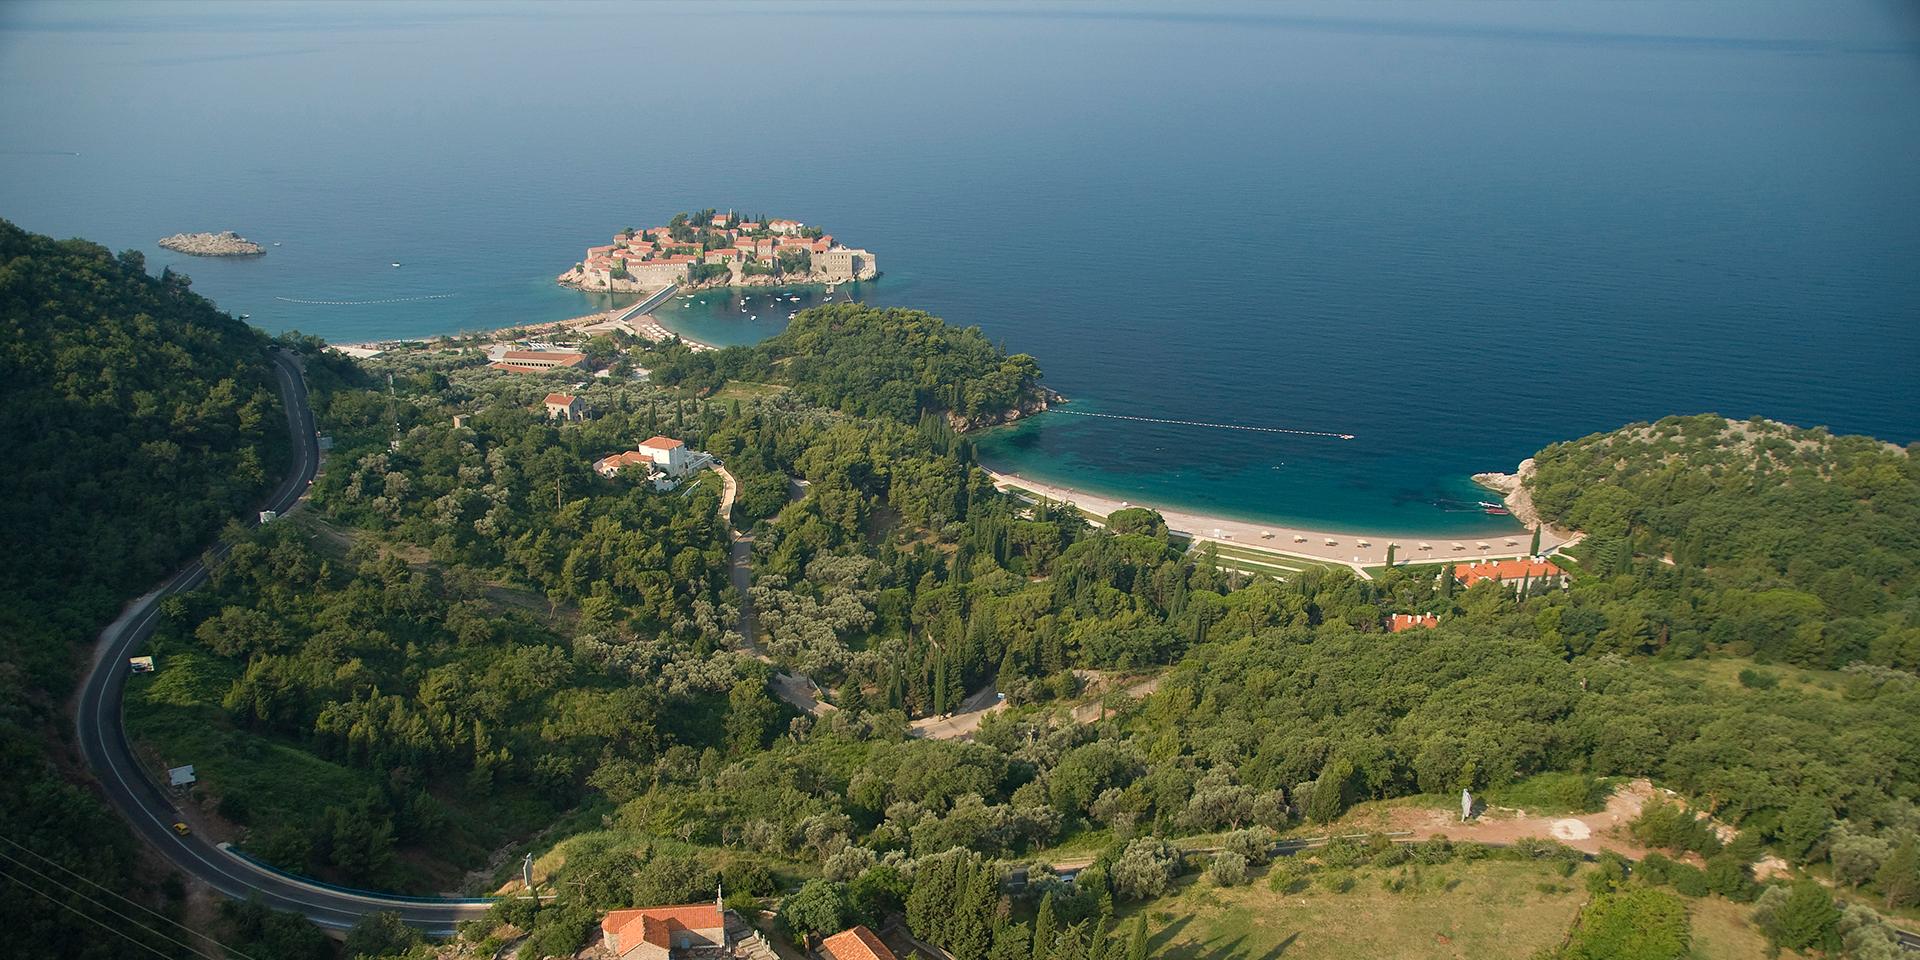 budva-beach budva-restaurants budva-yacht budva montenegro